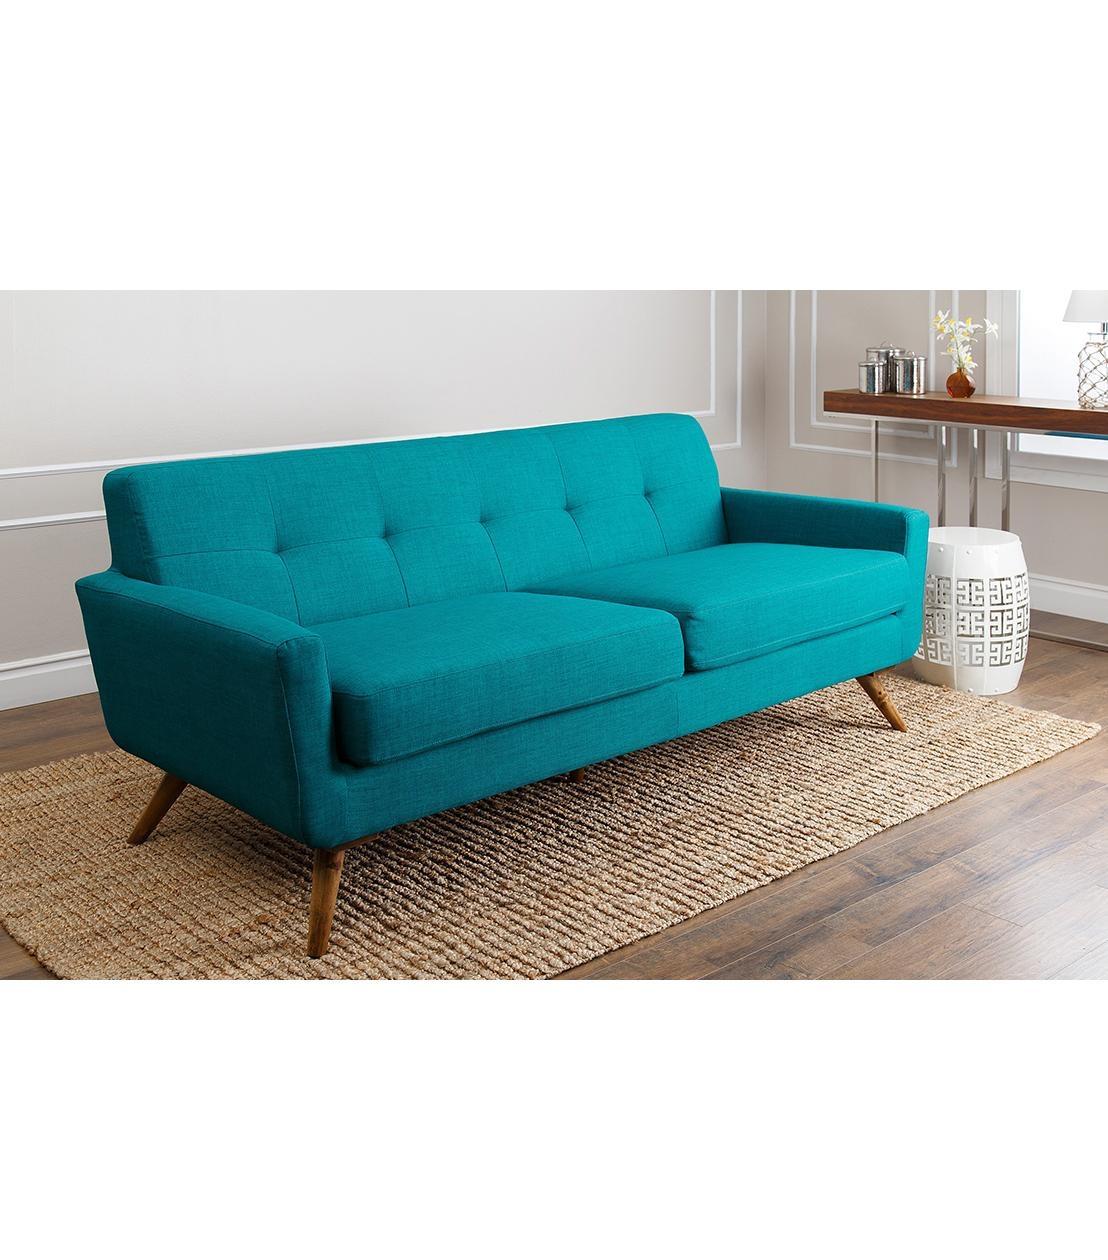 Sofas : Bradley Modern Sofa, Teal Regarding Abbyson Sofas (Image 14 of 20)